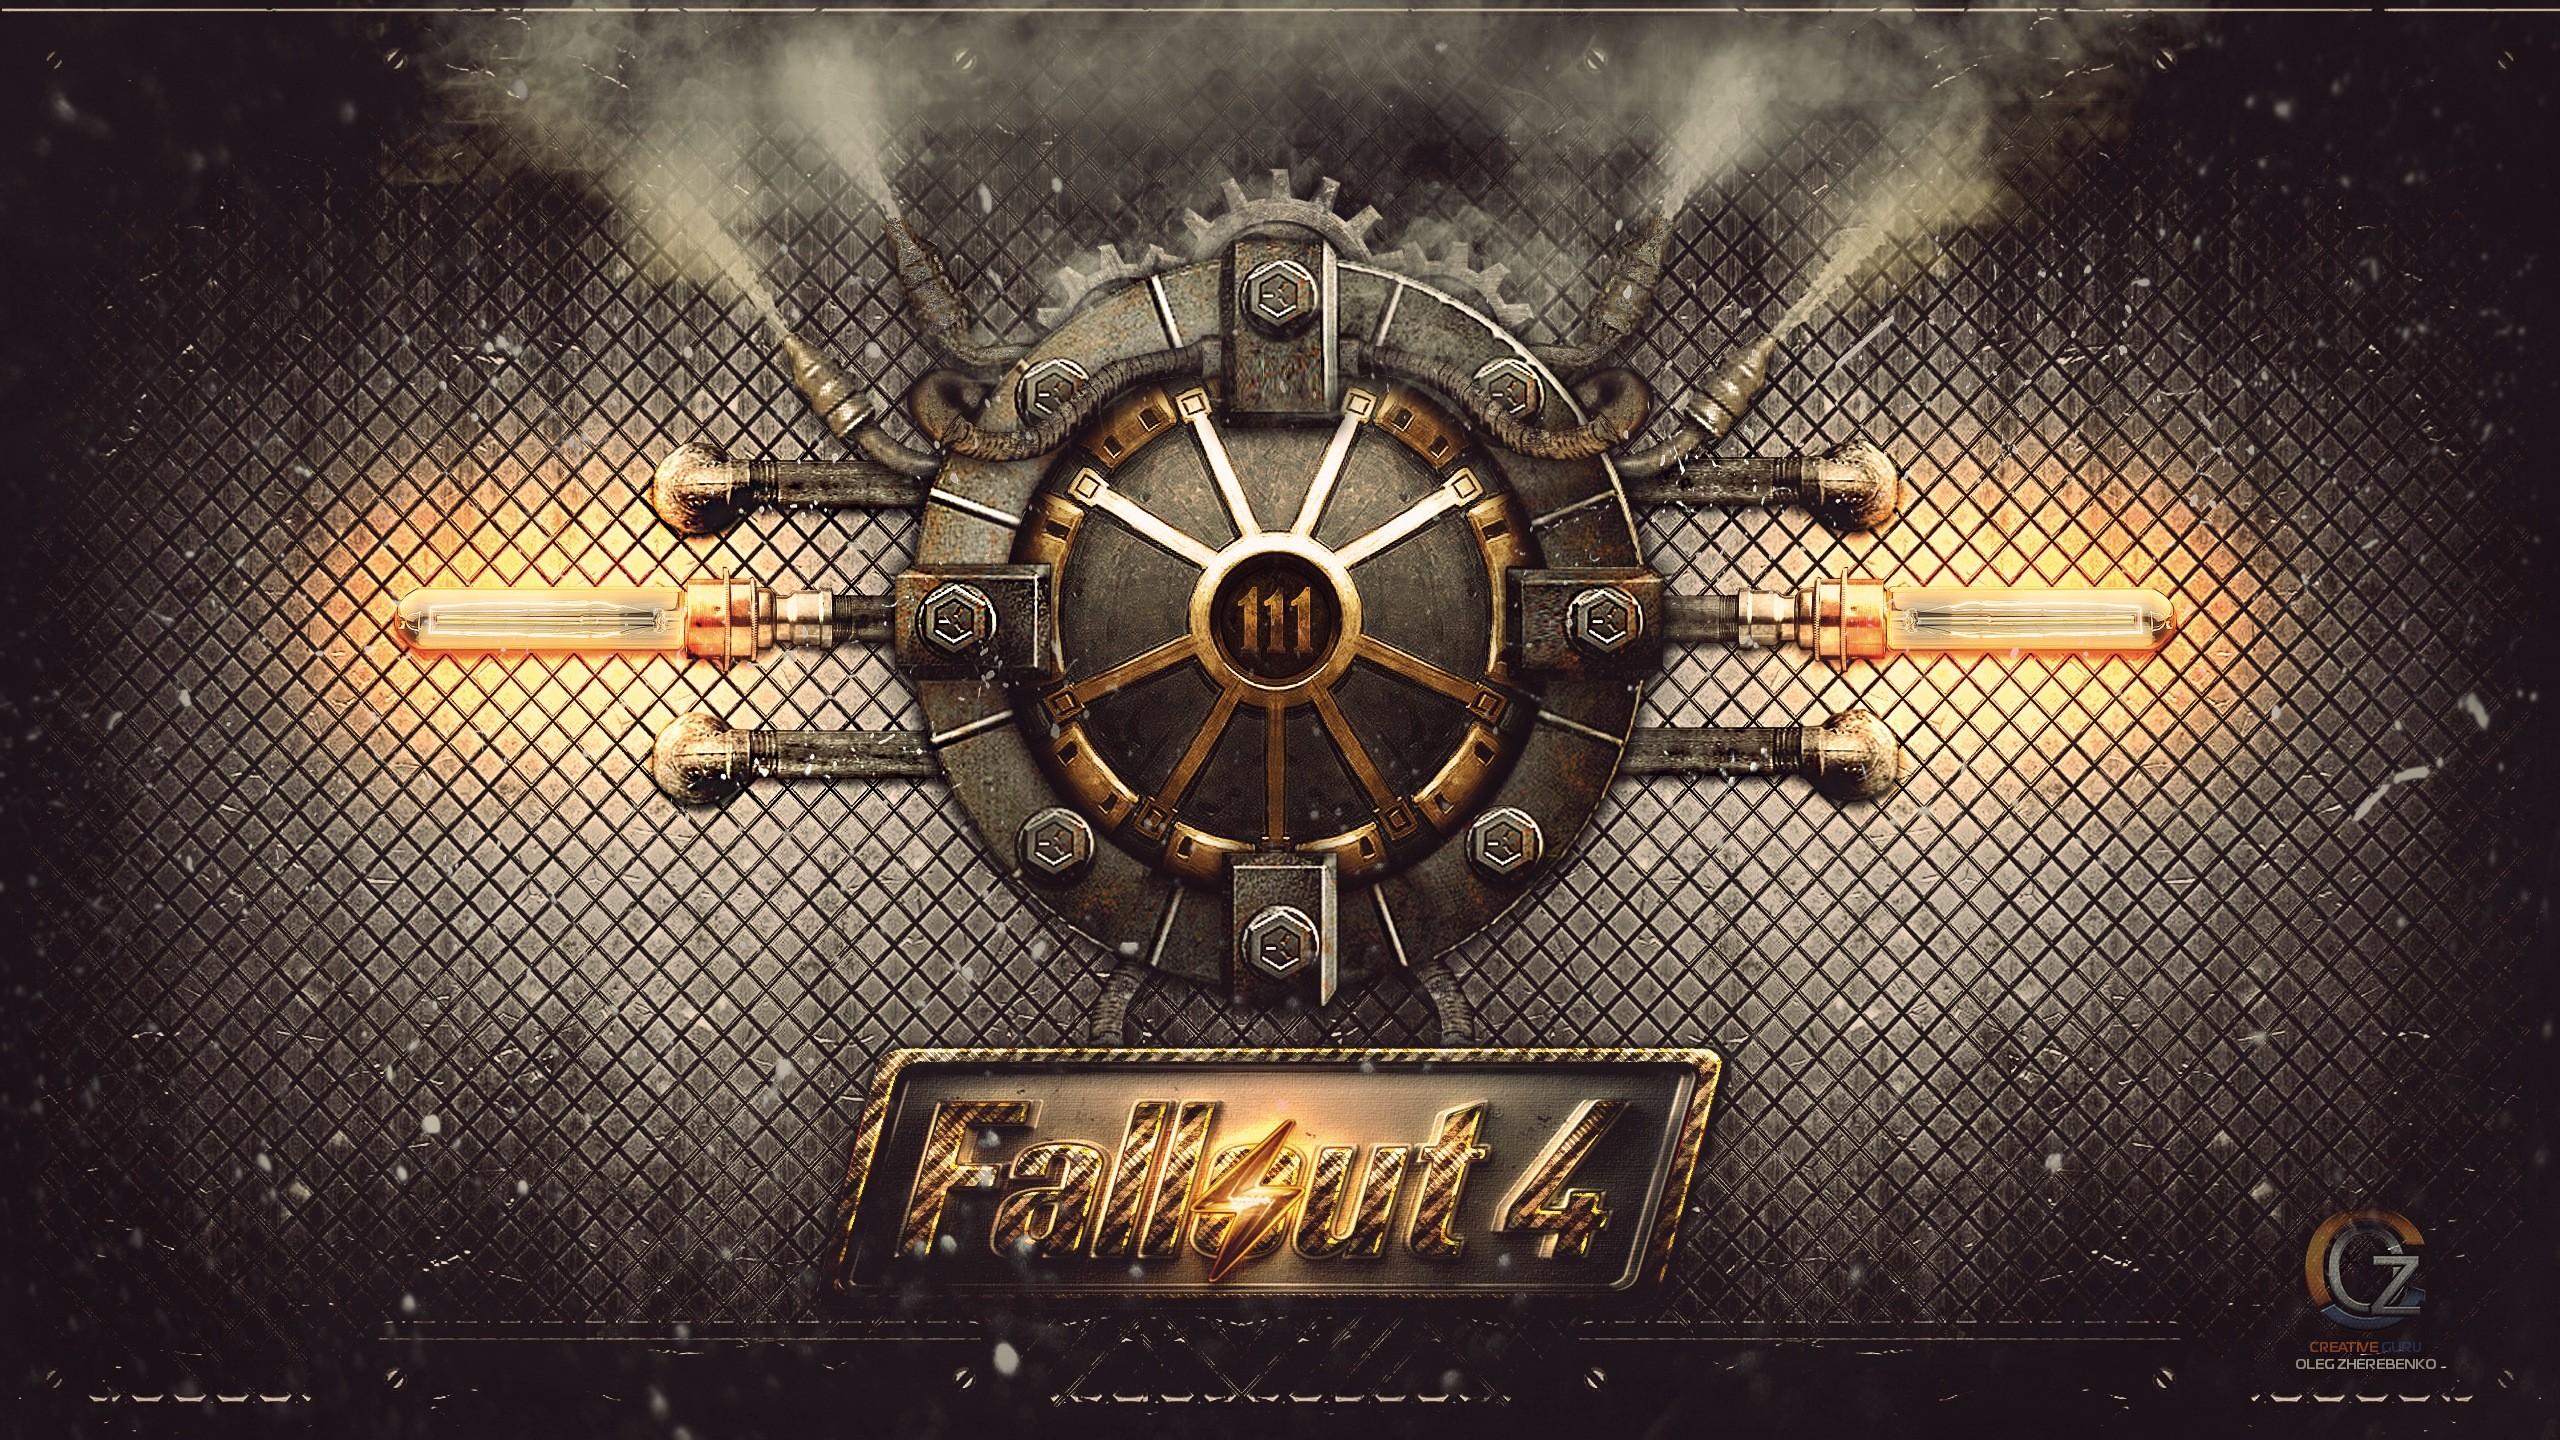 Fallout 4 Wallpaper Hd Resolution …